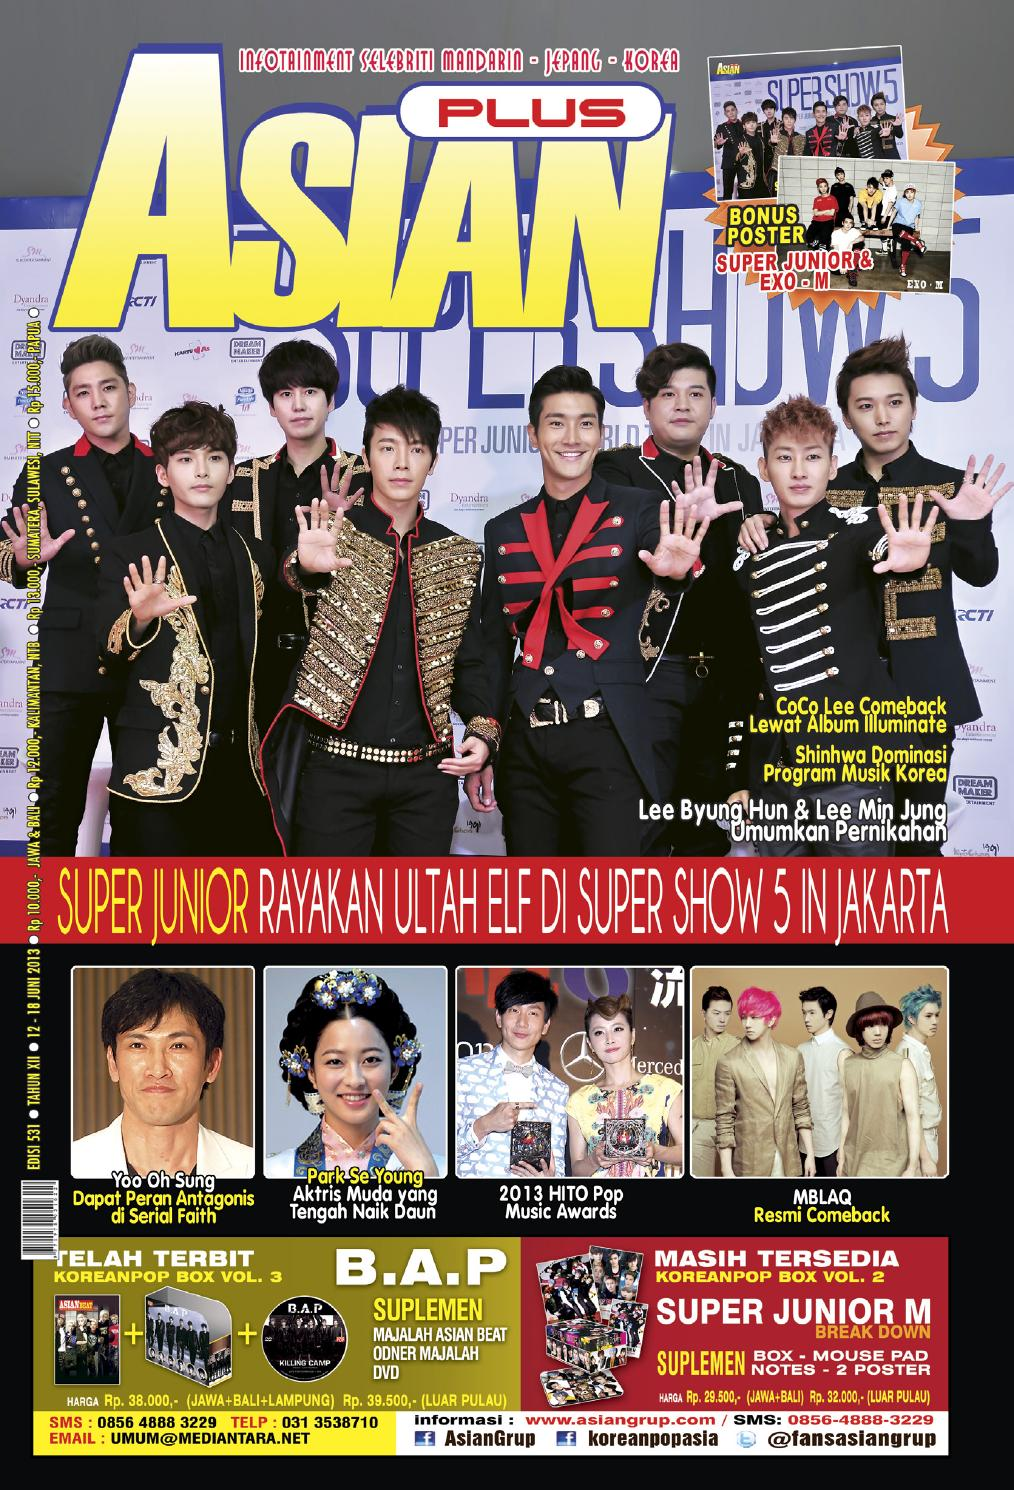 Asian Plus Edisi 531 By Asianplus Issuu Krezi Kamis 29 Jam Tangan Usb Mancis Keren